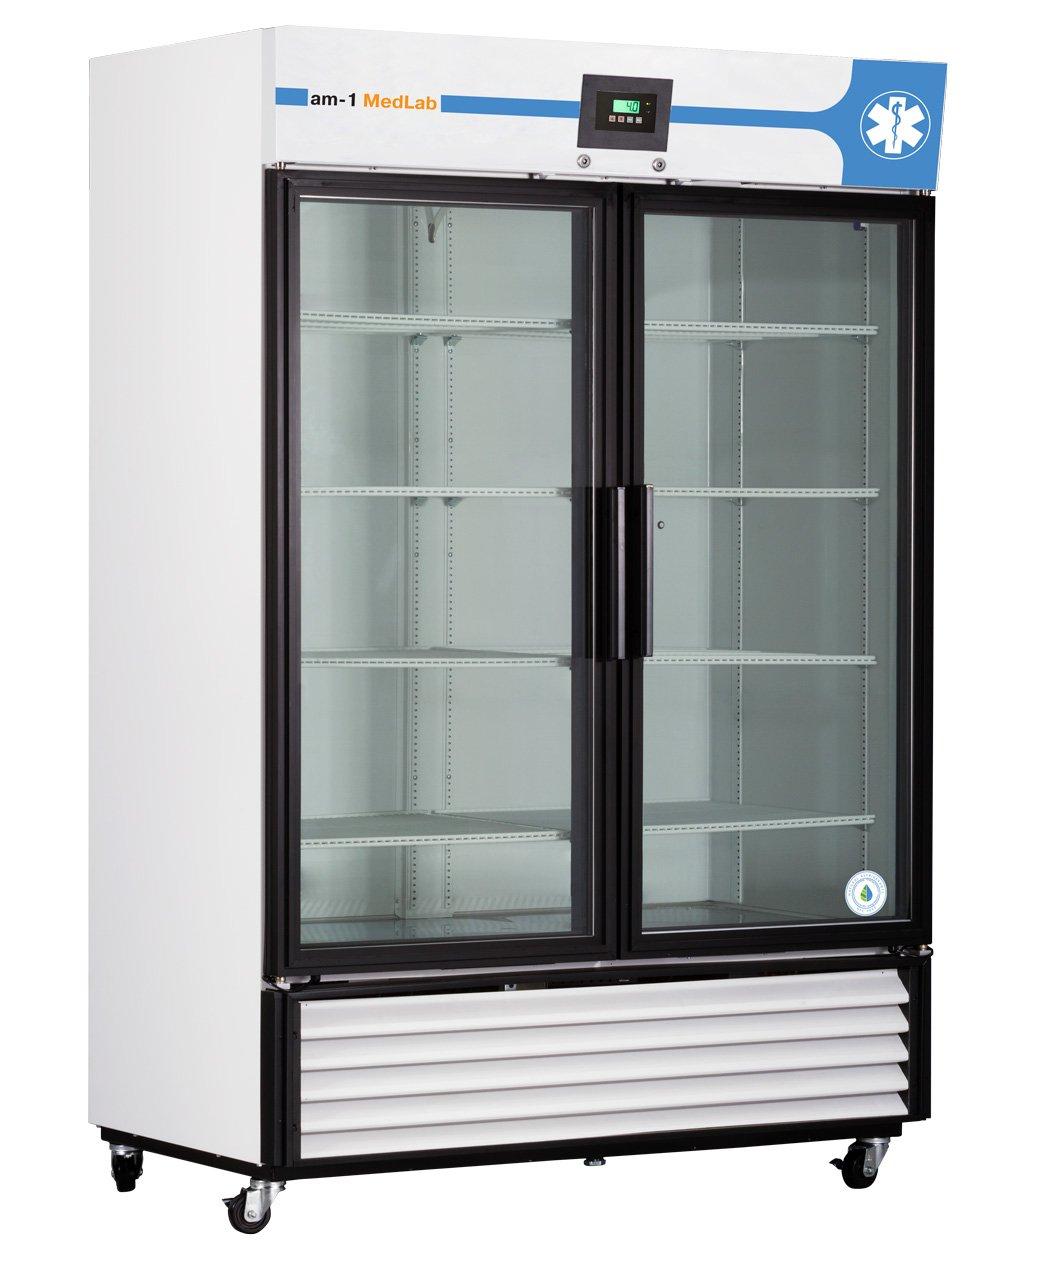 White ft Medical//Laboratory Refrigerator am-1 AM-LAB-1D-RSP-23 MedLab Premium Solid Door 23 cu